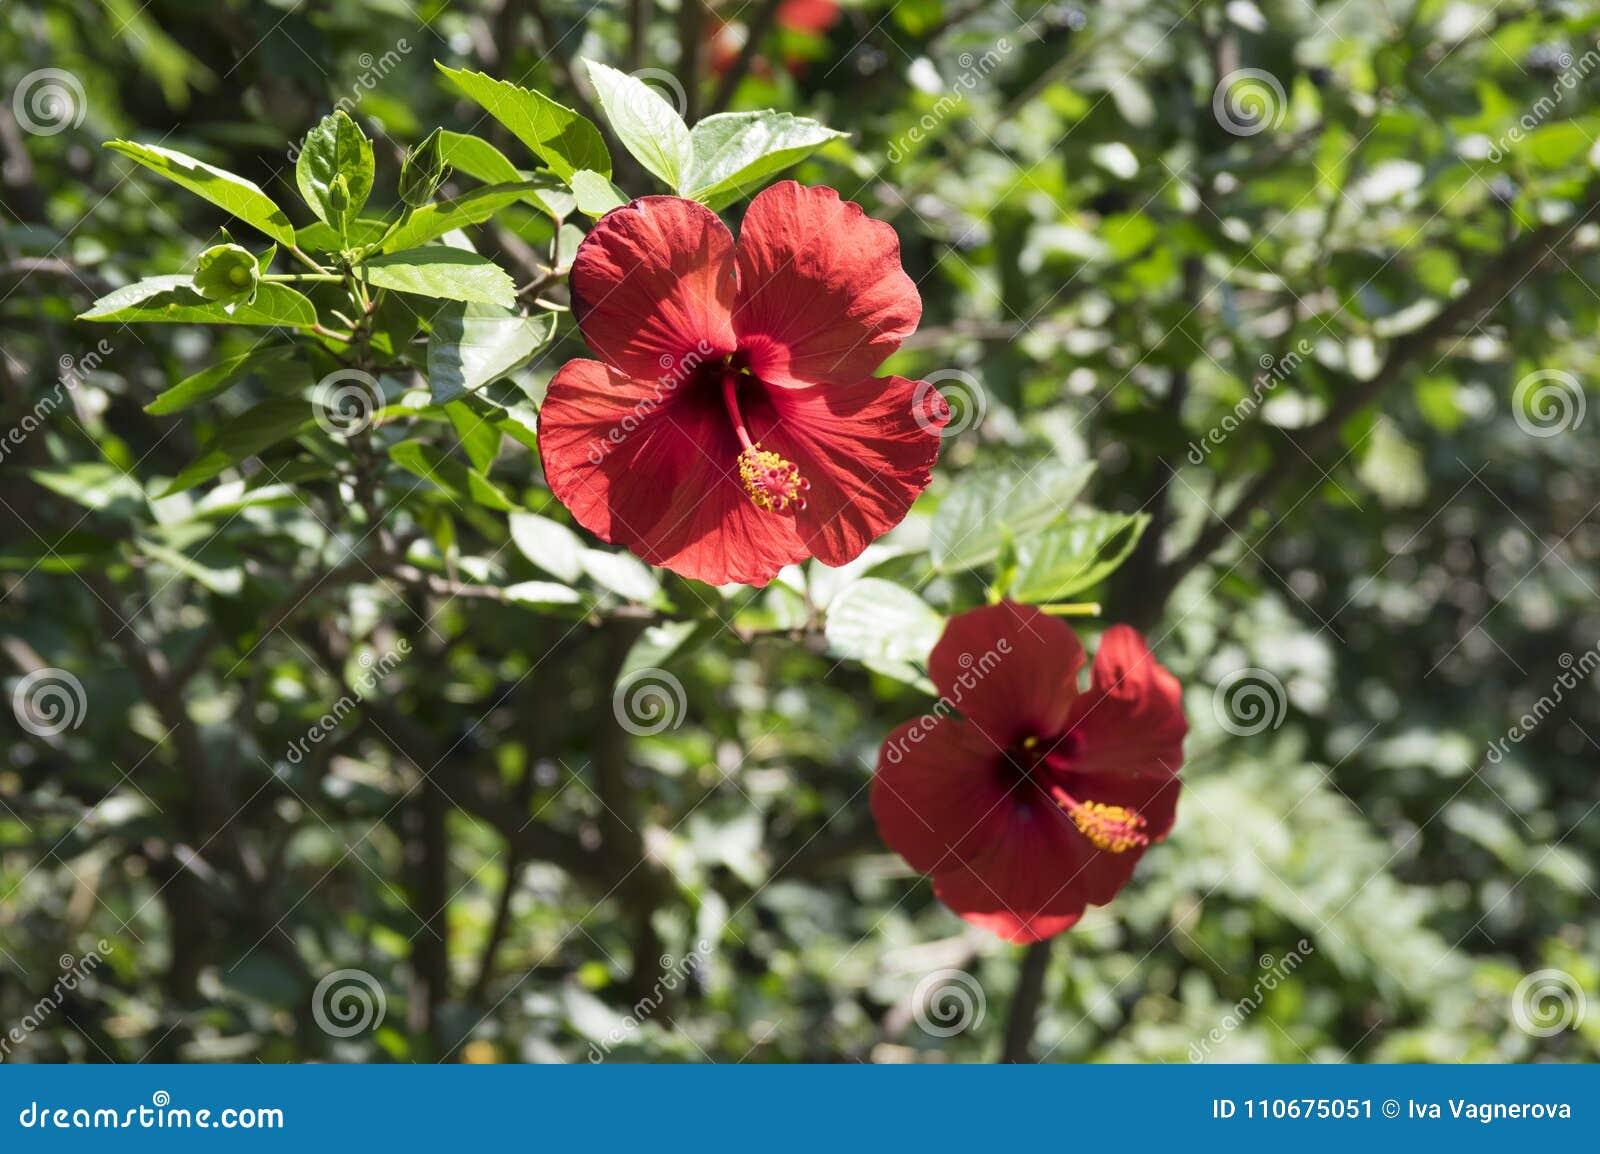 Hibiscus rosa sinensis chinese hibiscus flowering shrub stock image download hibiscus rosa sinensis chinese hibiscus flowering shrub stock image image of blooming izmirmasajfo